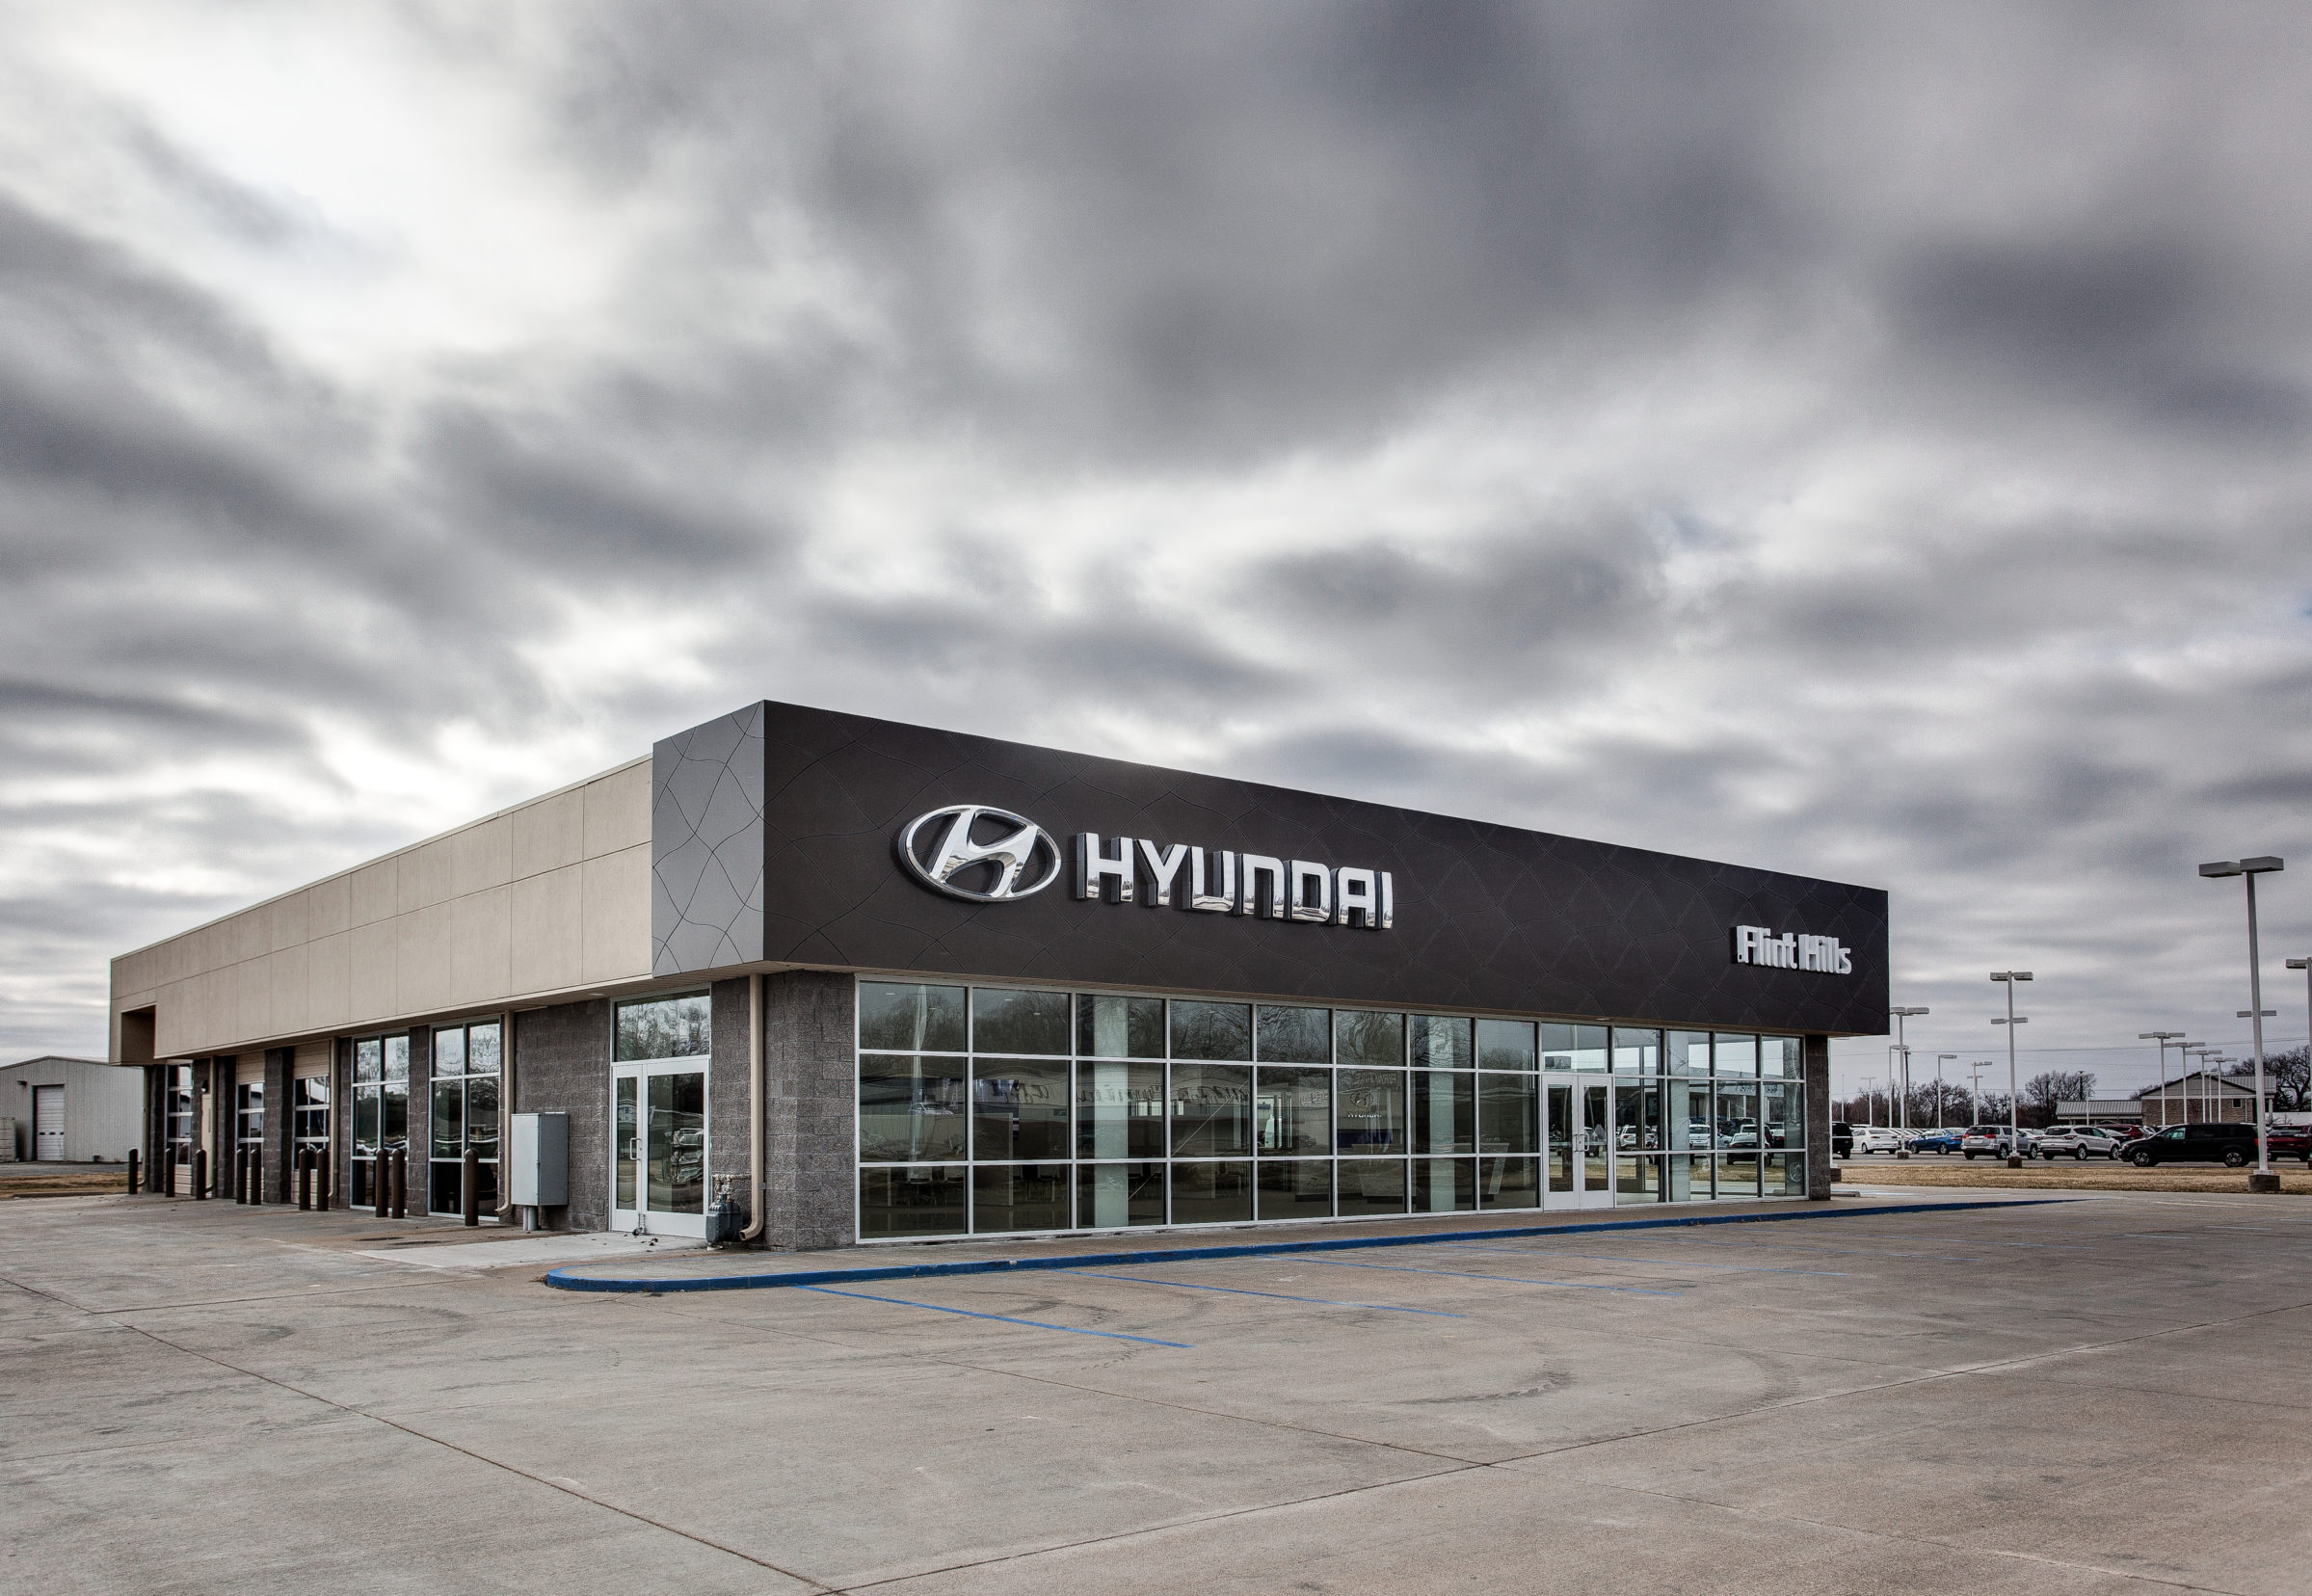 Flint Hills Hyundai Dealership